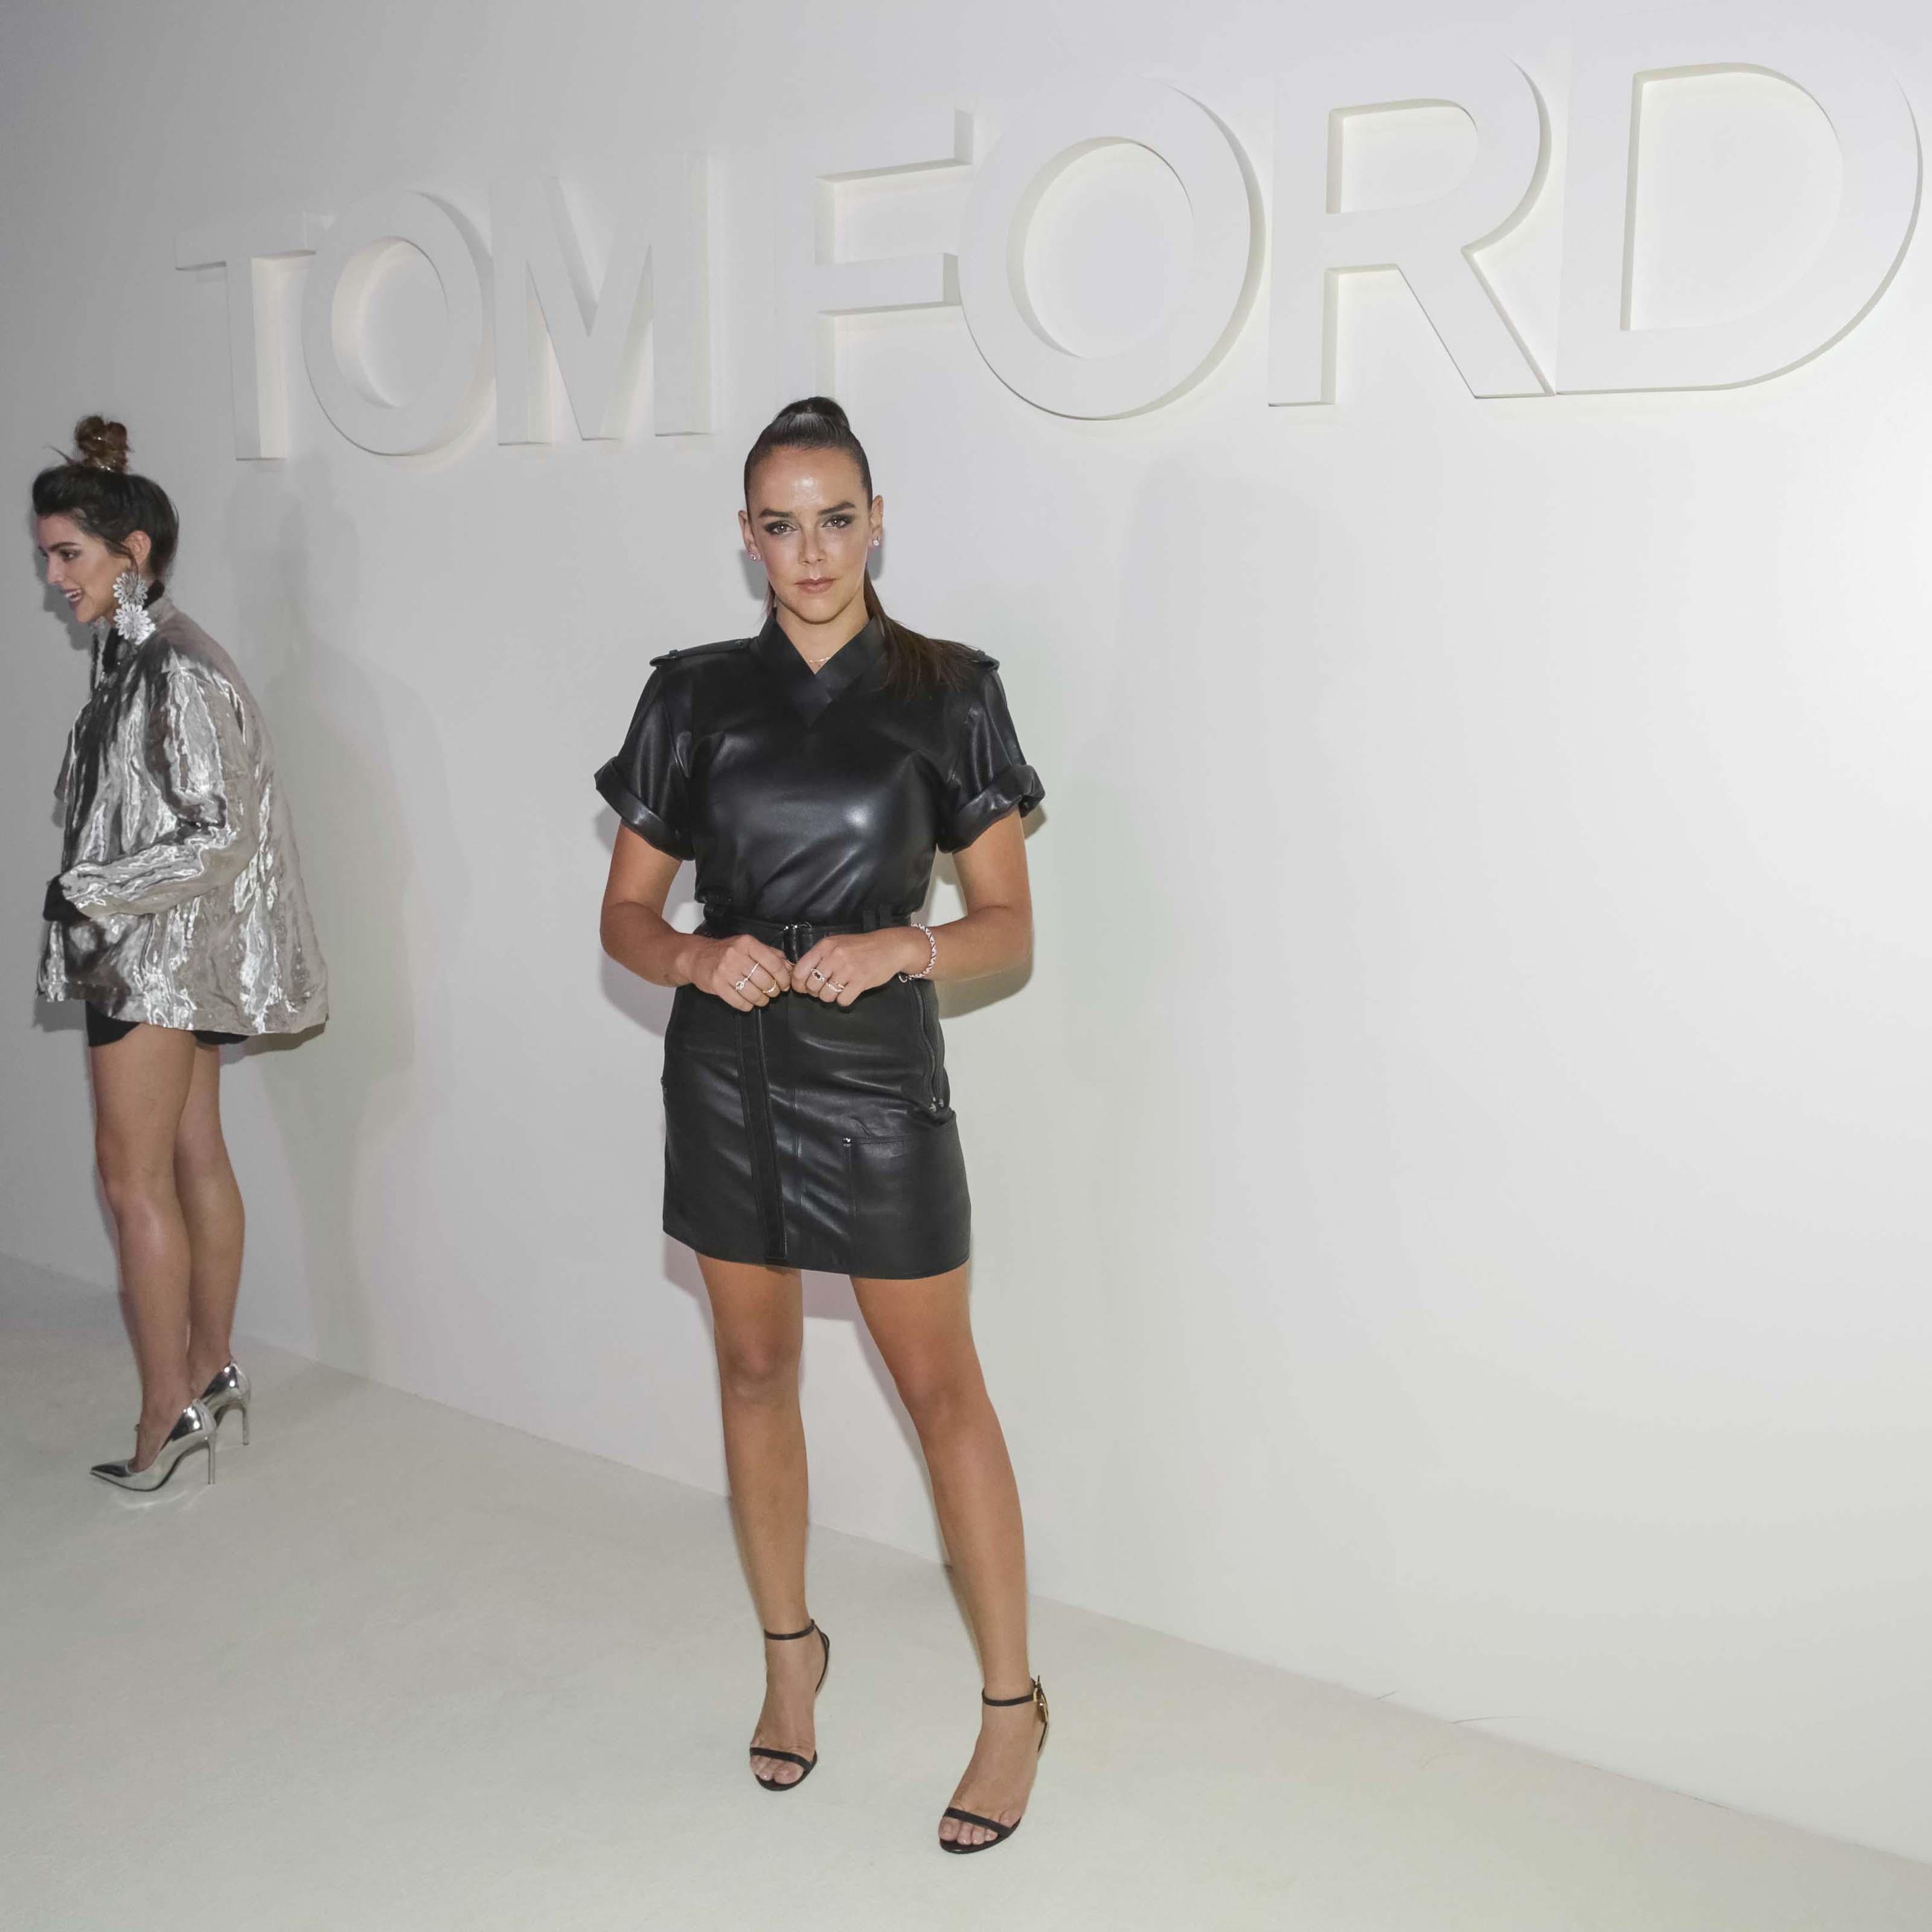 Pauline Ducruet attends the Tom Ford fashion show